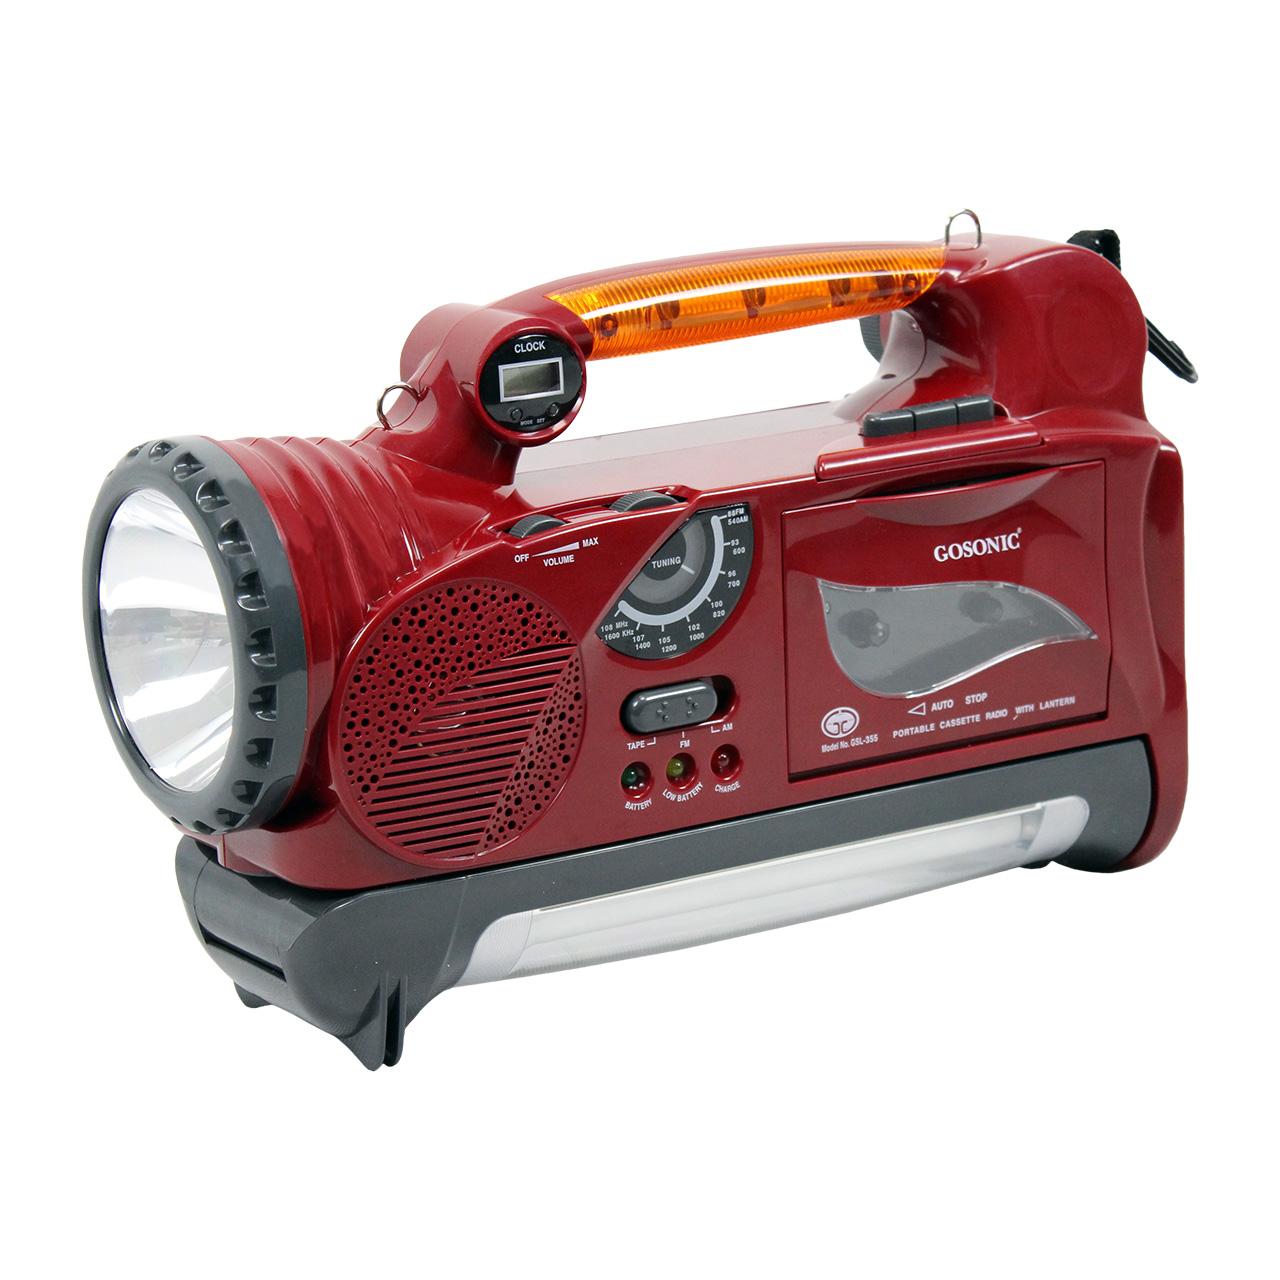 نور افکن دستی گوسونیک مدل 355